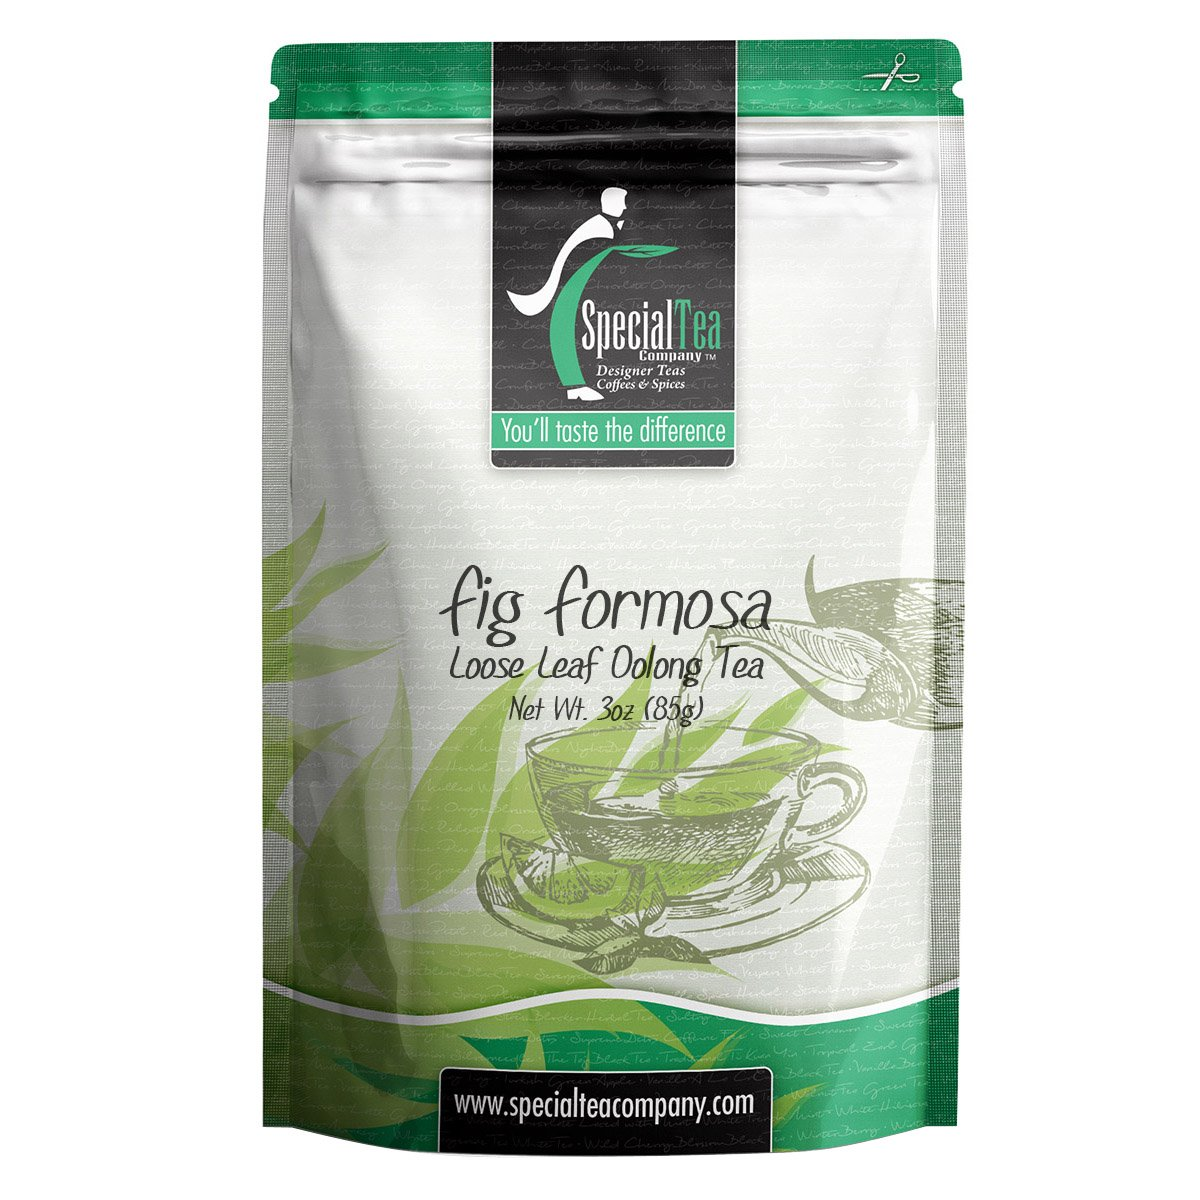 Special Tea Fig Formosa Oolong Tea, Loose Leaf, 3 Ounce by Special Tea